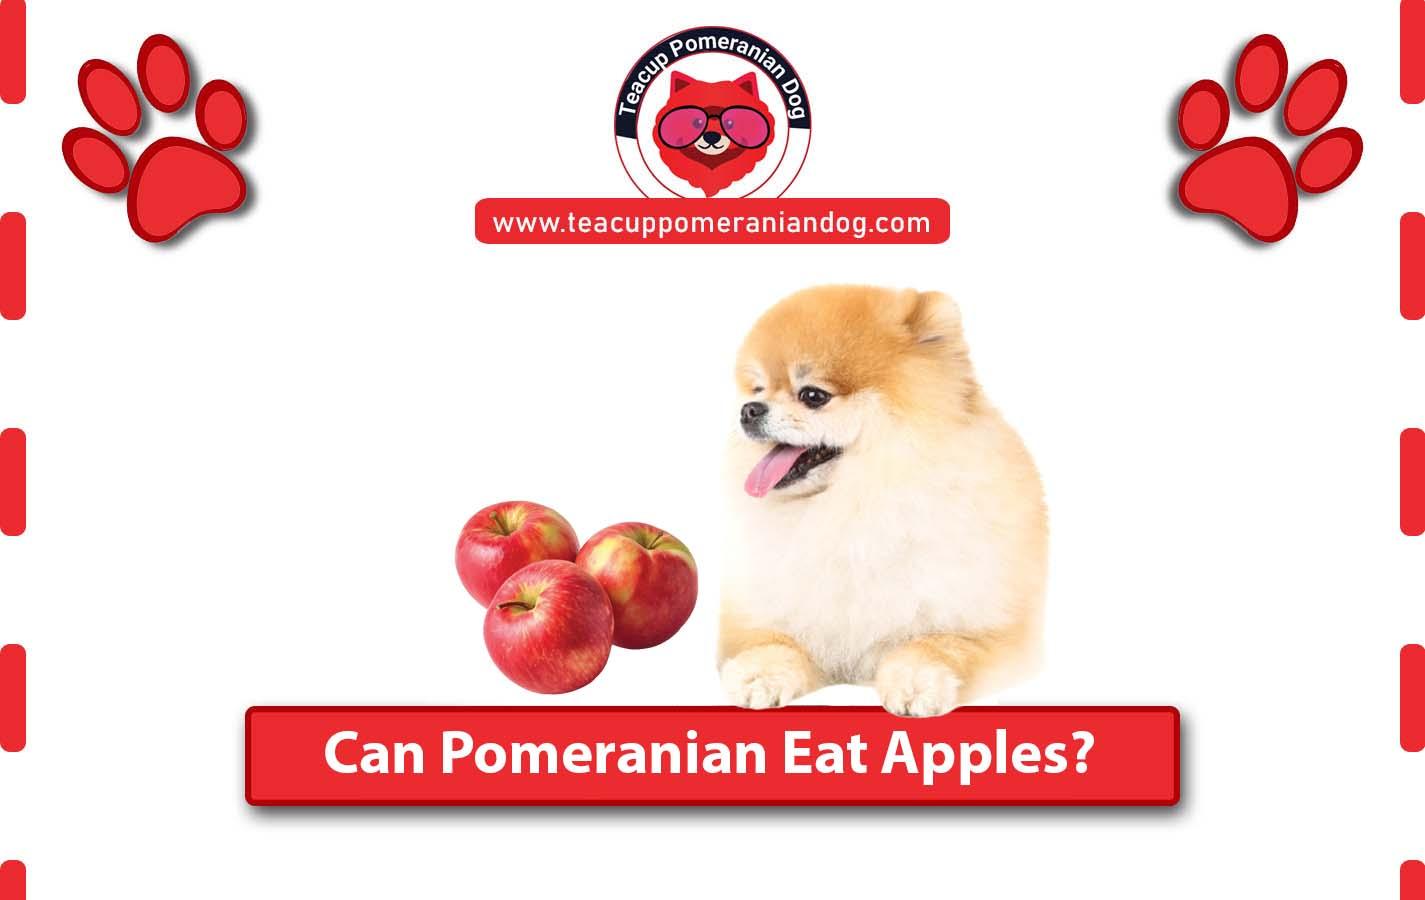 Can Pomeranian Eat Apples